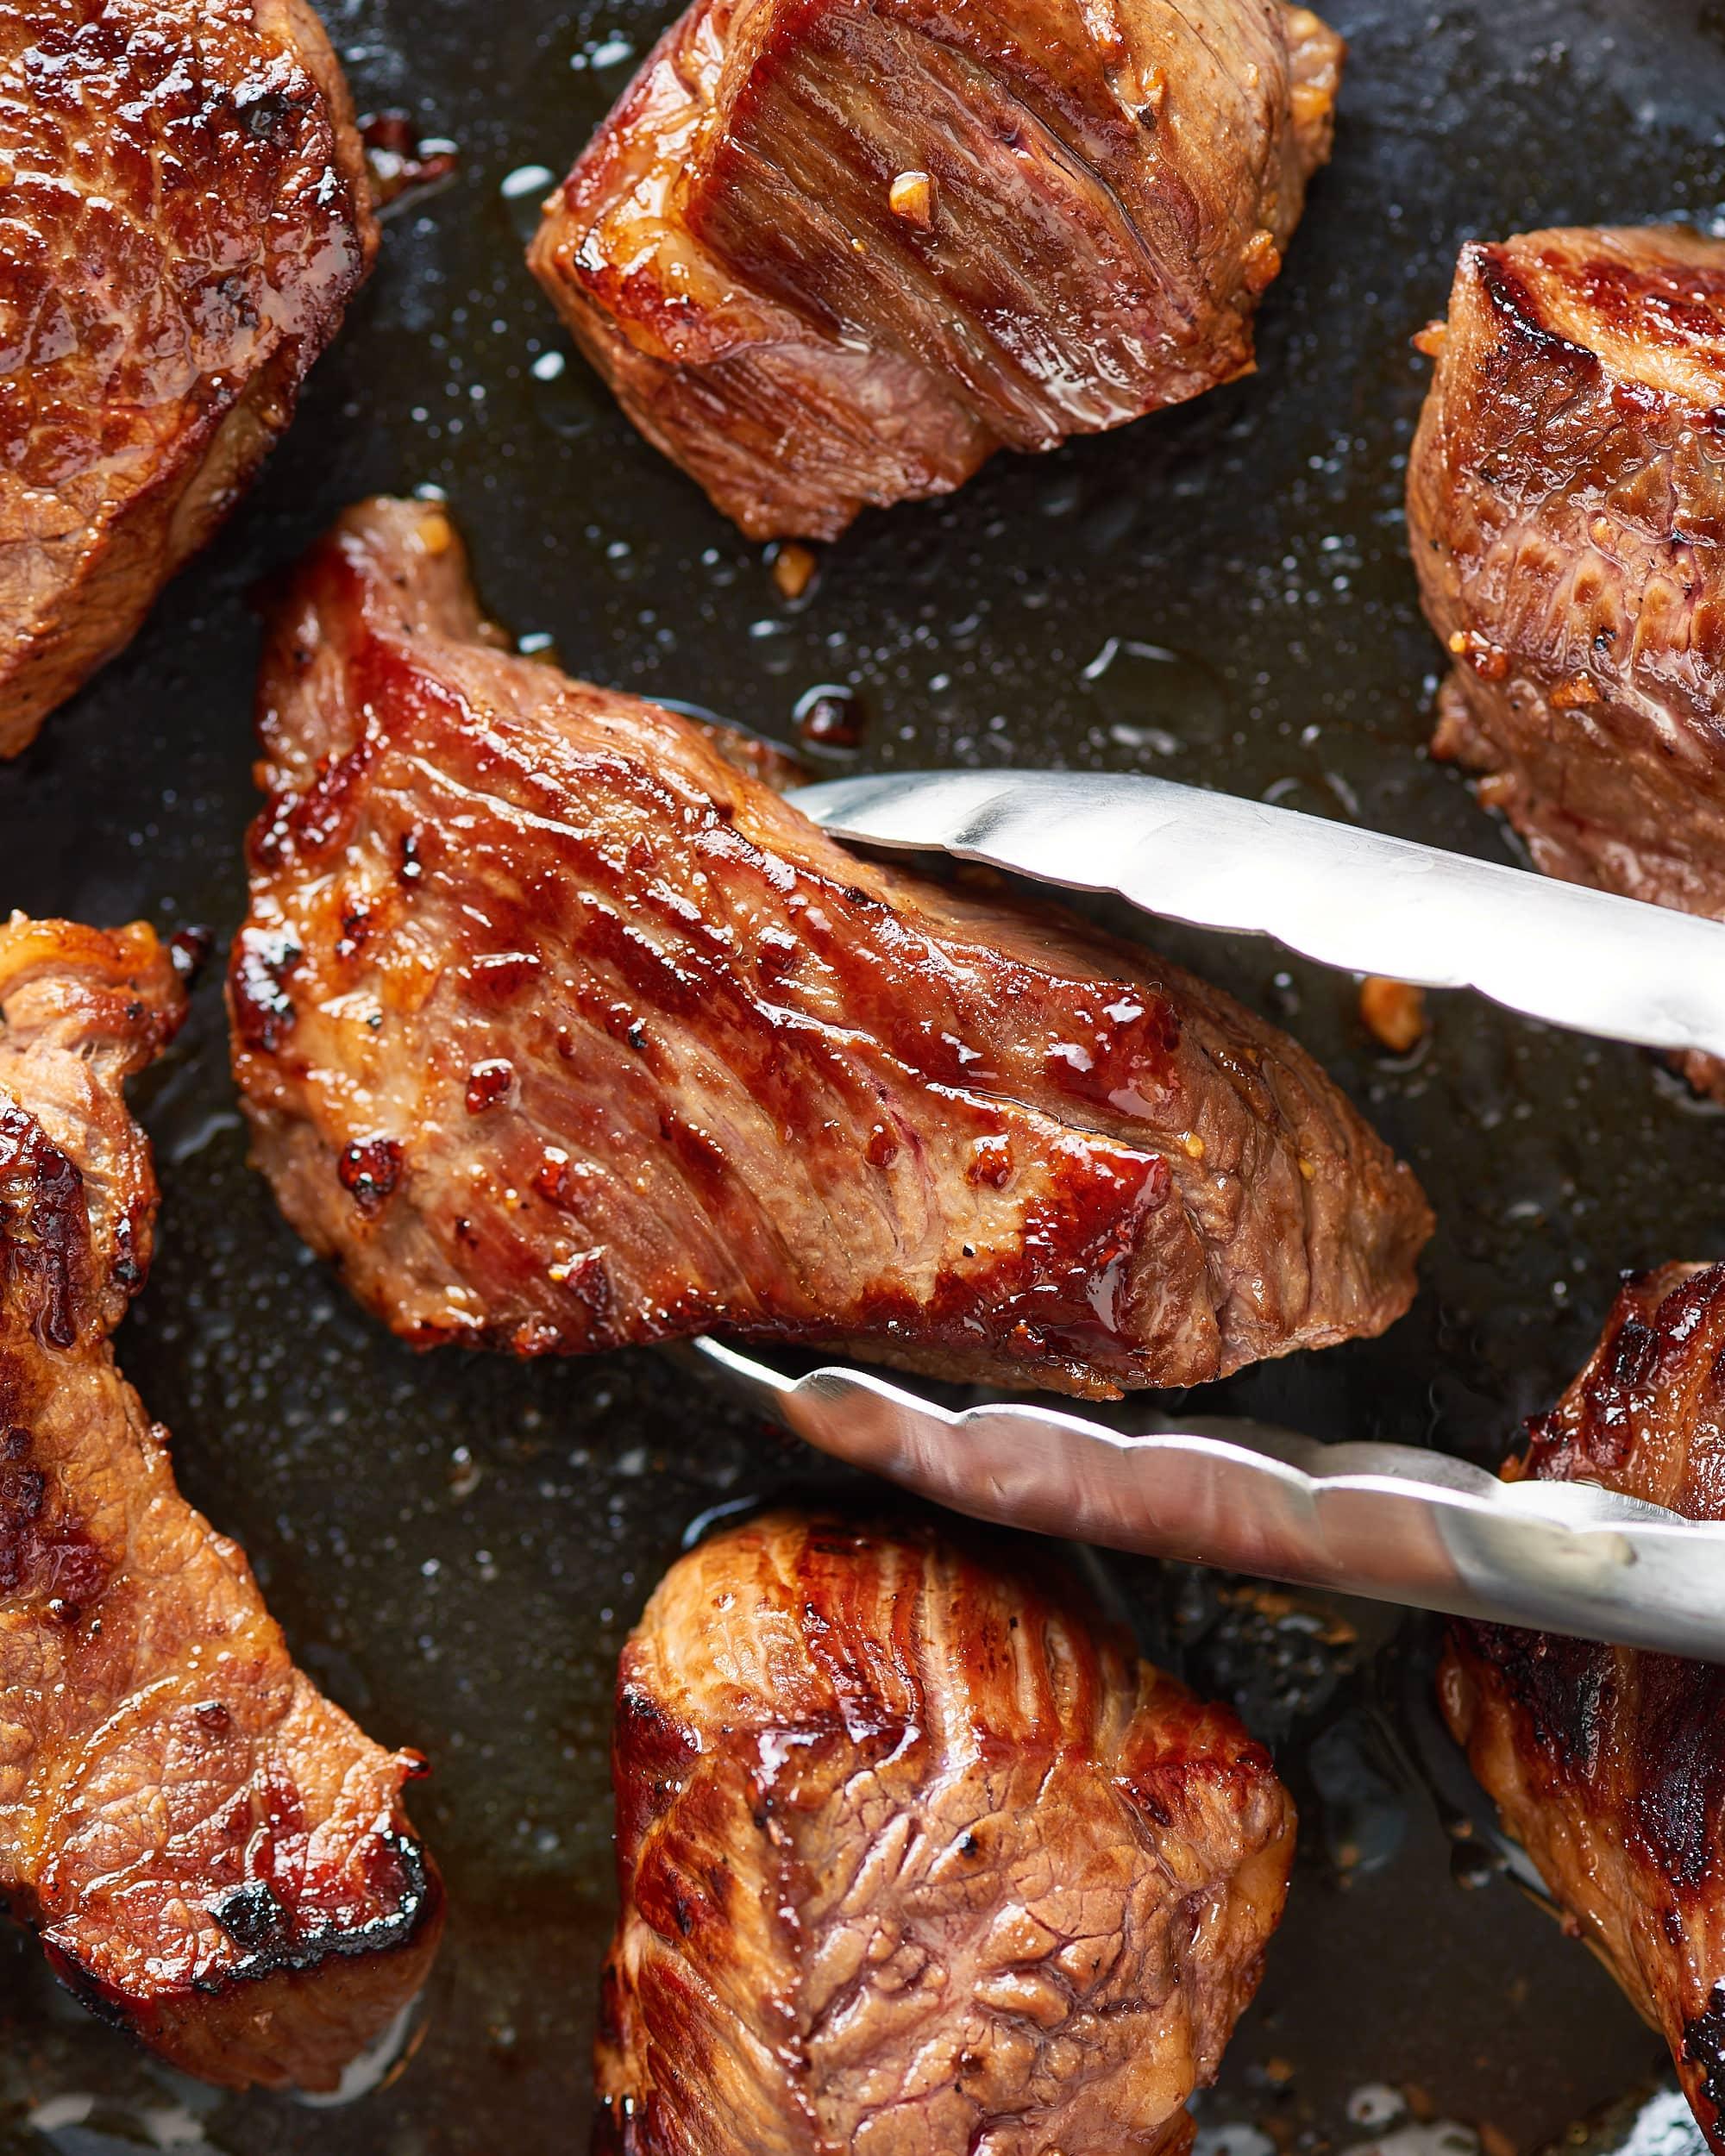 Treat Yourself to Garlic Butter Steak Bites Tonight